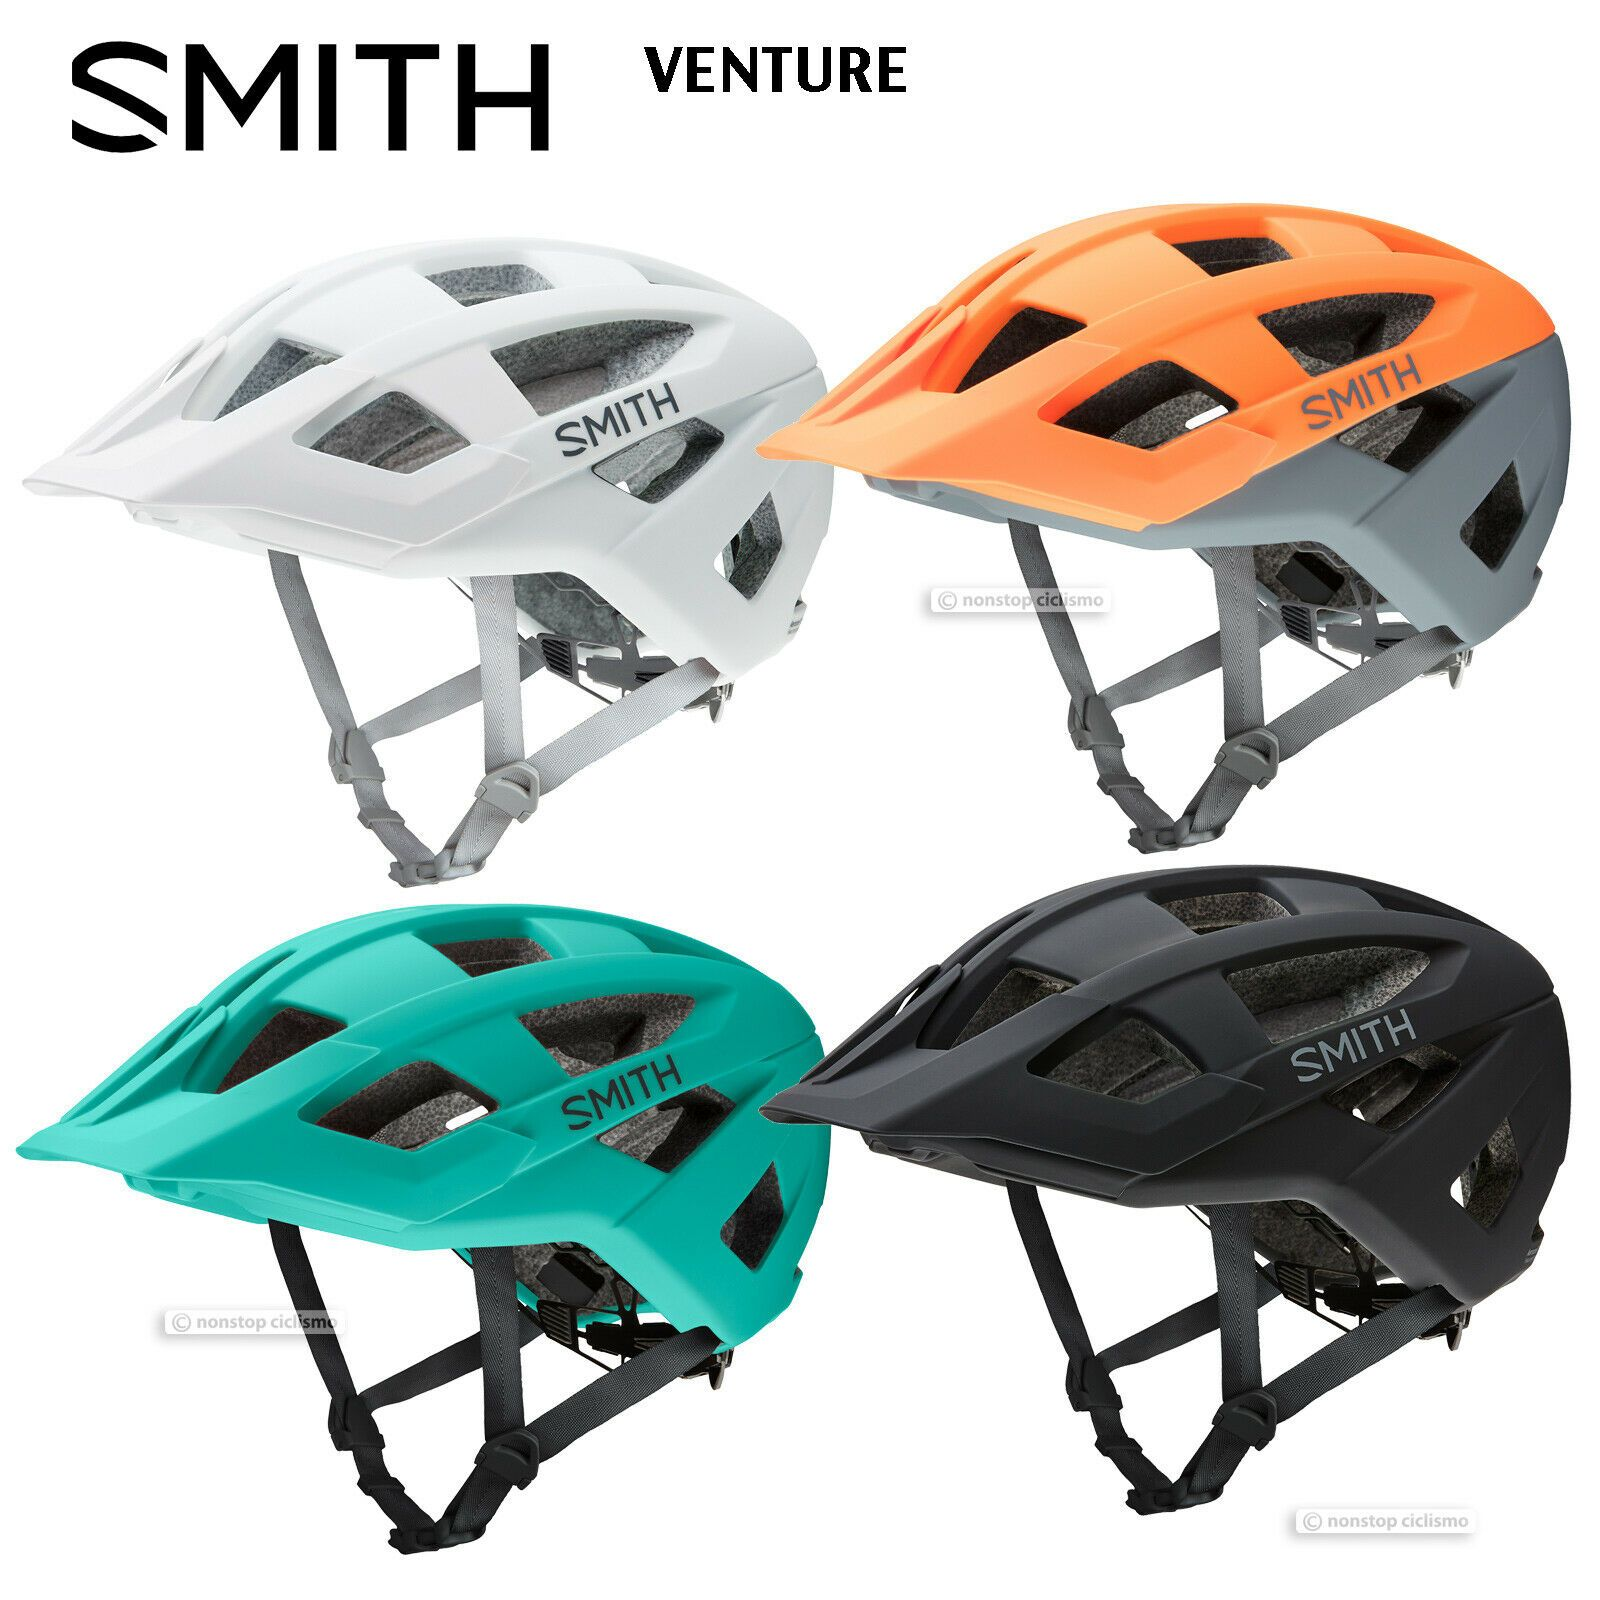 New 2019 Smith Optics Venture Mtb Mountain Bike Helmet All